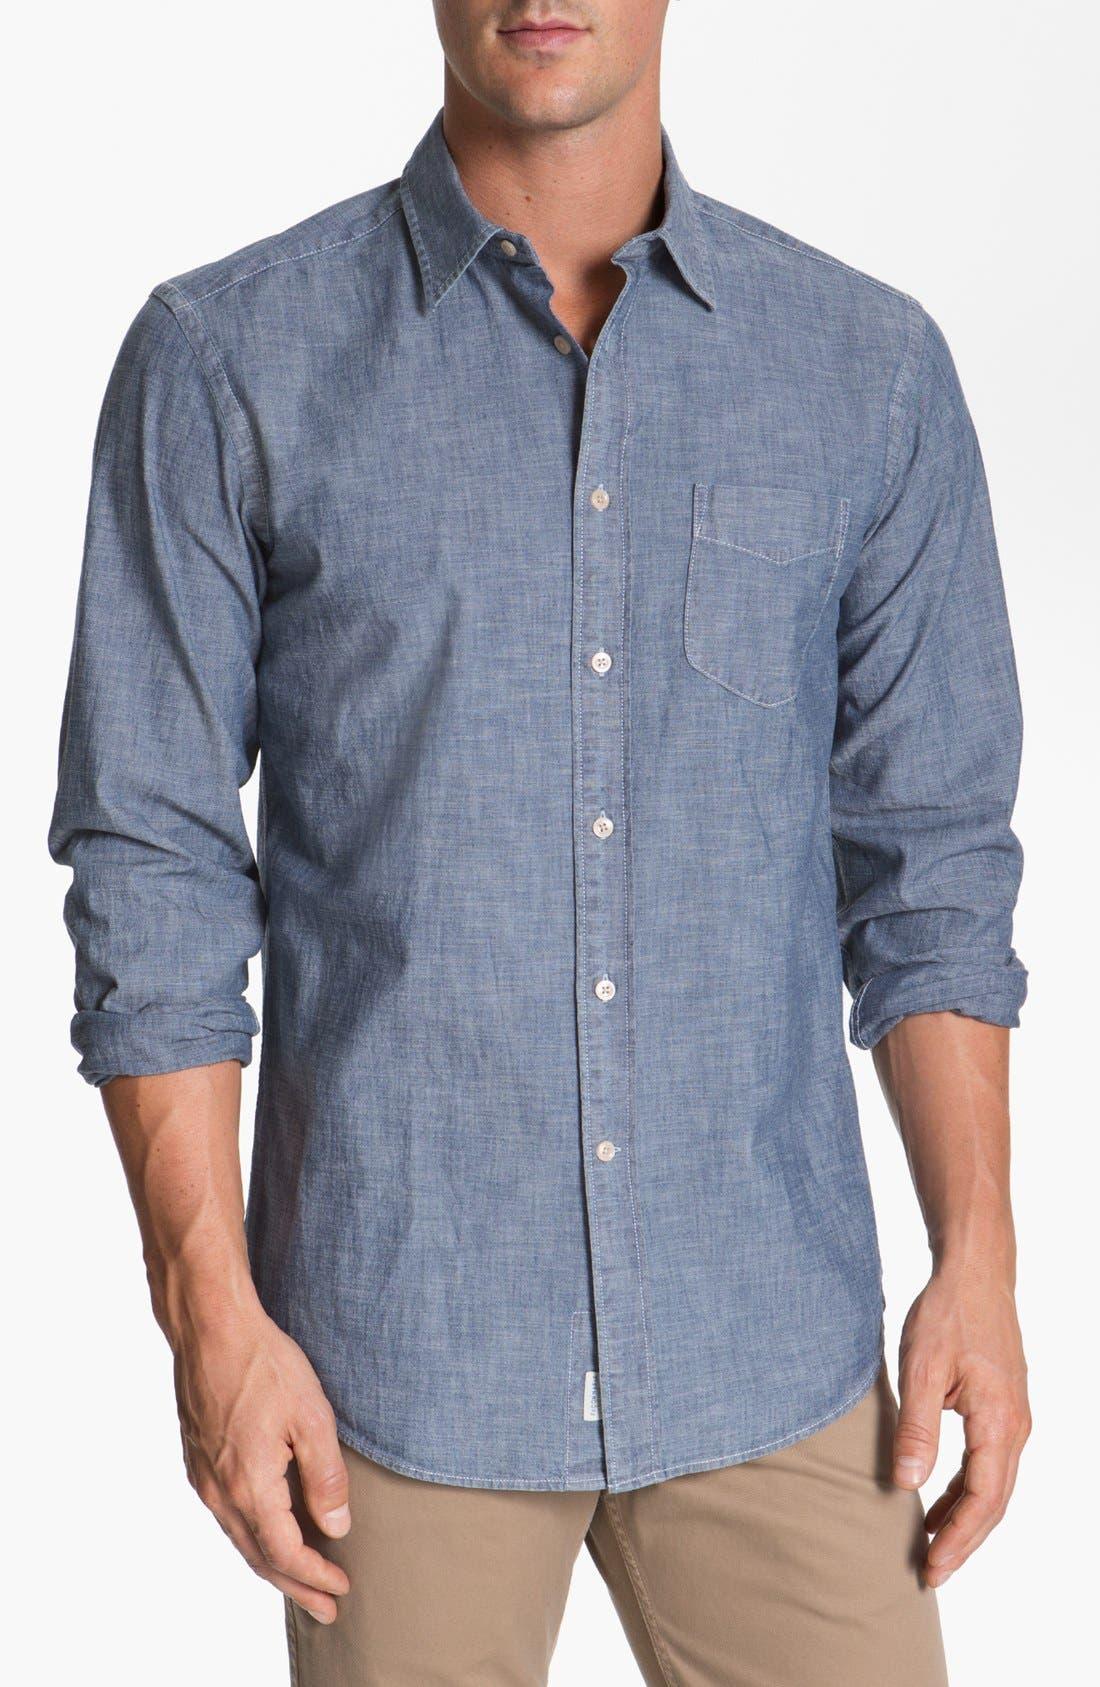 Alternate Image 1 Selected - Façonnable Tailored Denim Regular Fit Chambray Sport Shirt